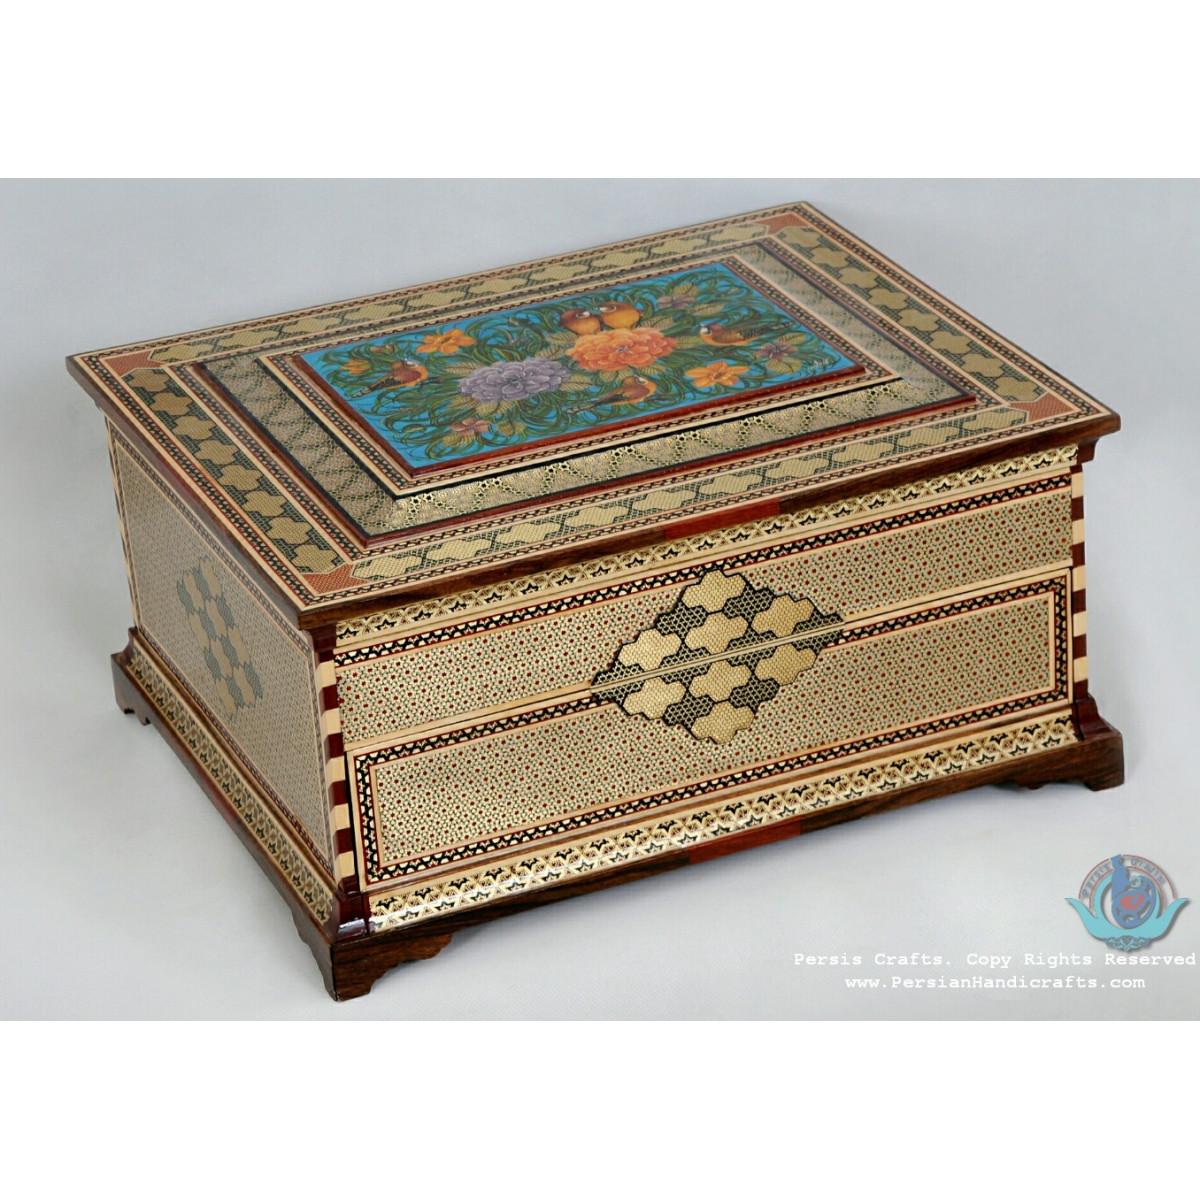 Premium Ark/Pyx Shape Khatam Marquetry Jewelry Box - PKH1061-Persian Handicrafts